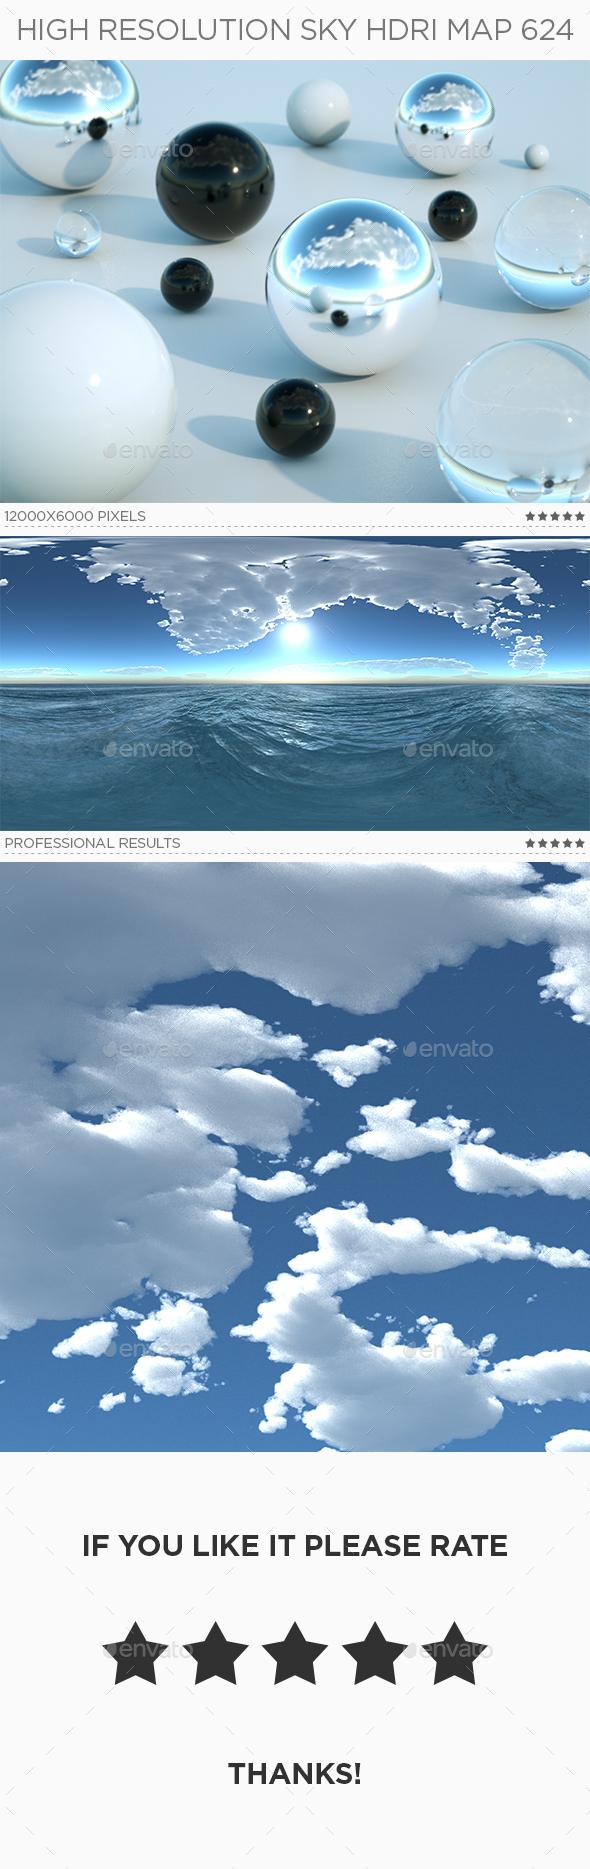 High Resolution Sky HDRi Map 624